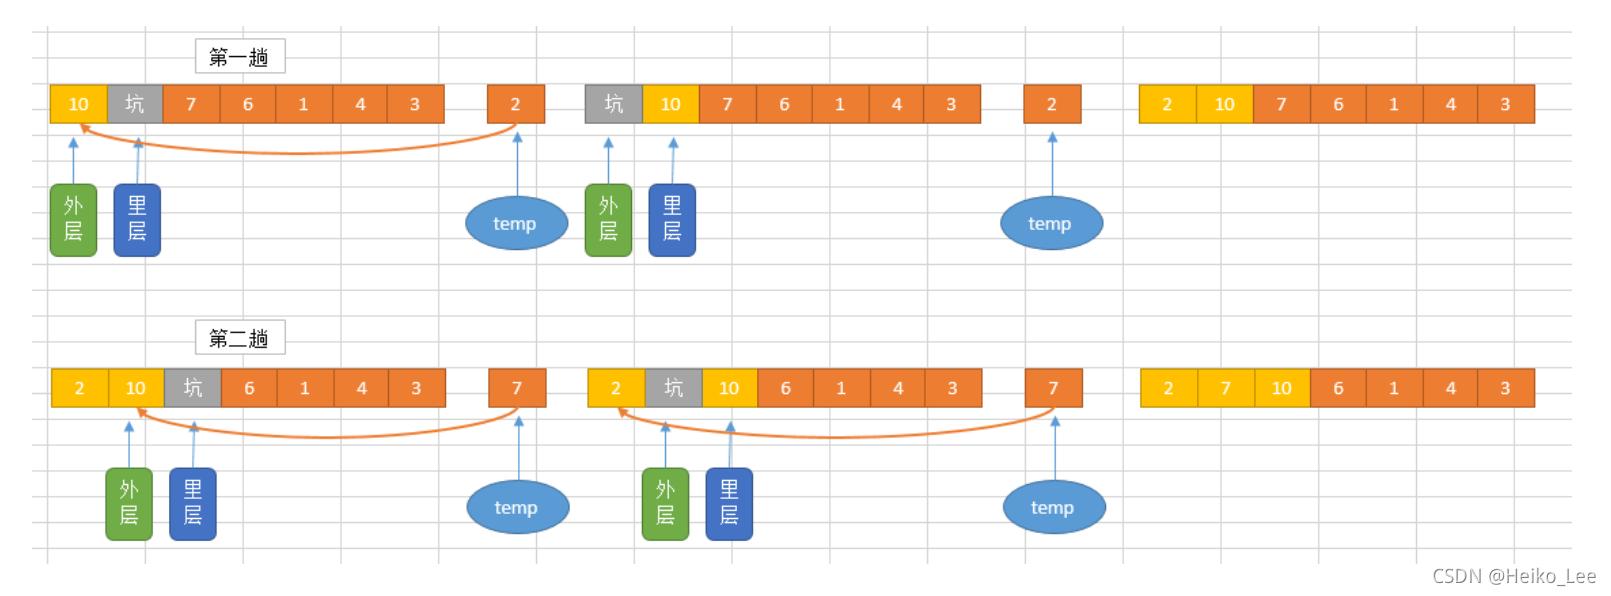 Python数据结构与算法 DAY 5